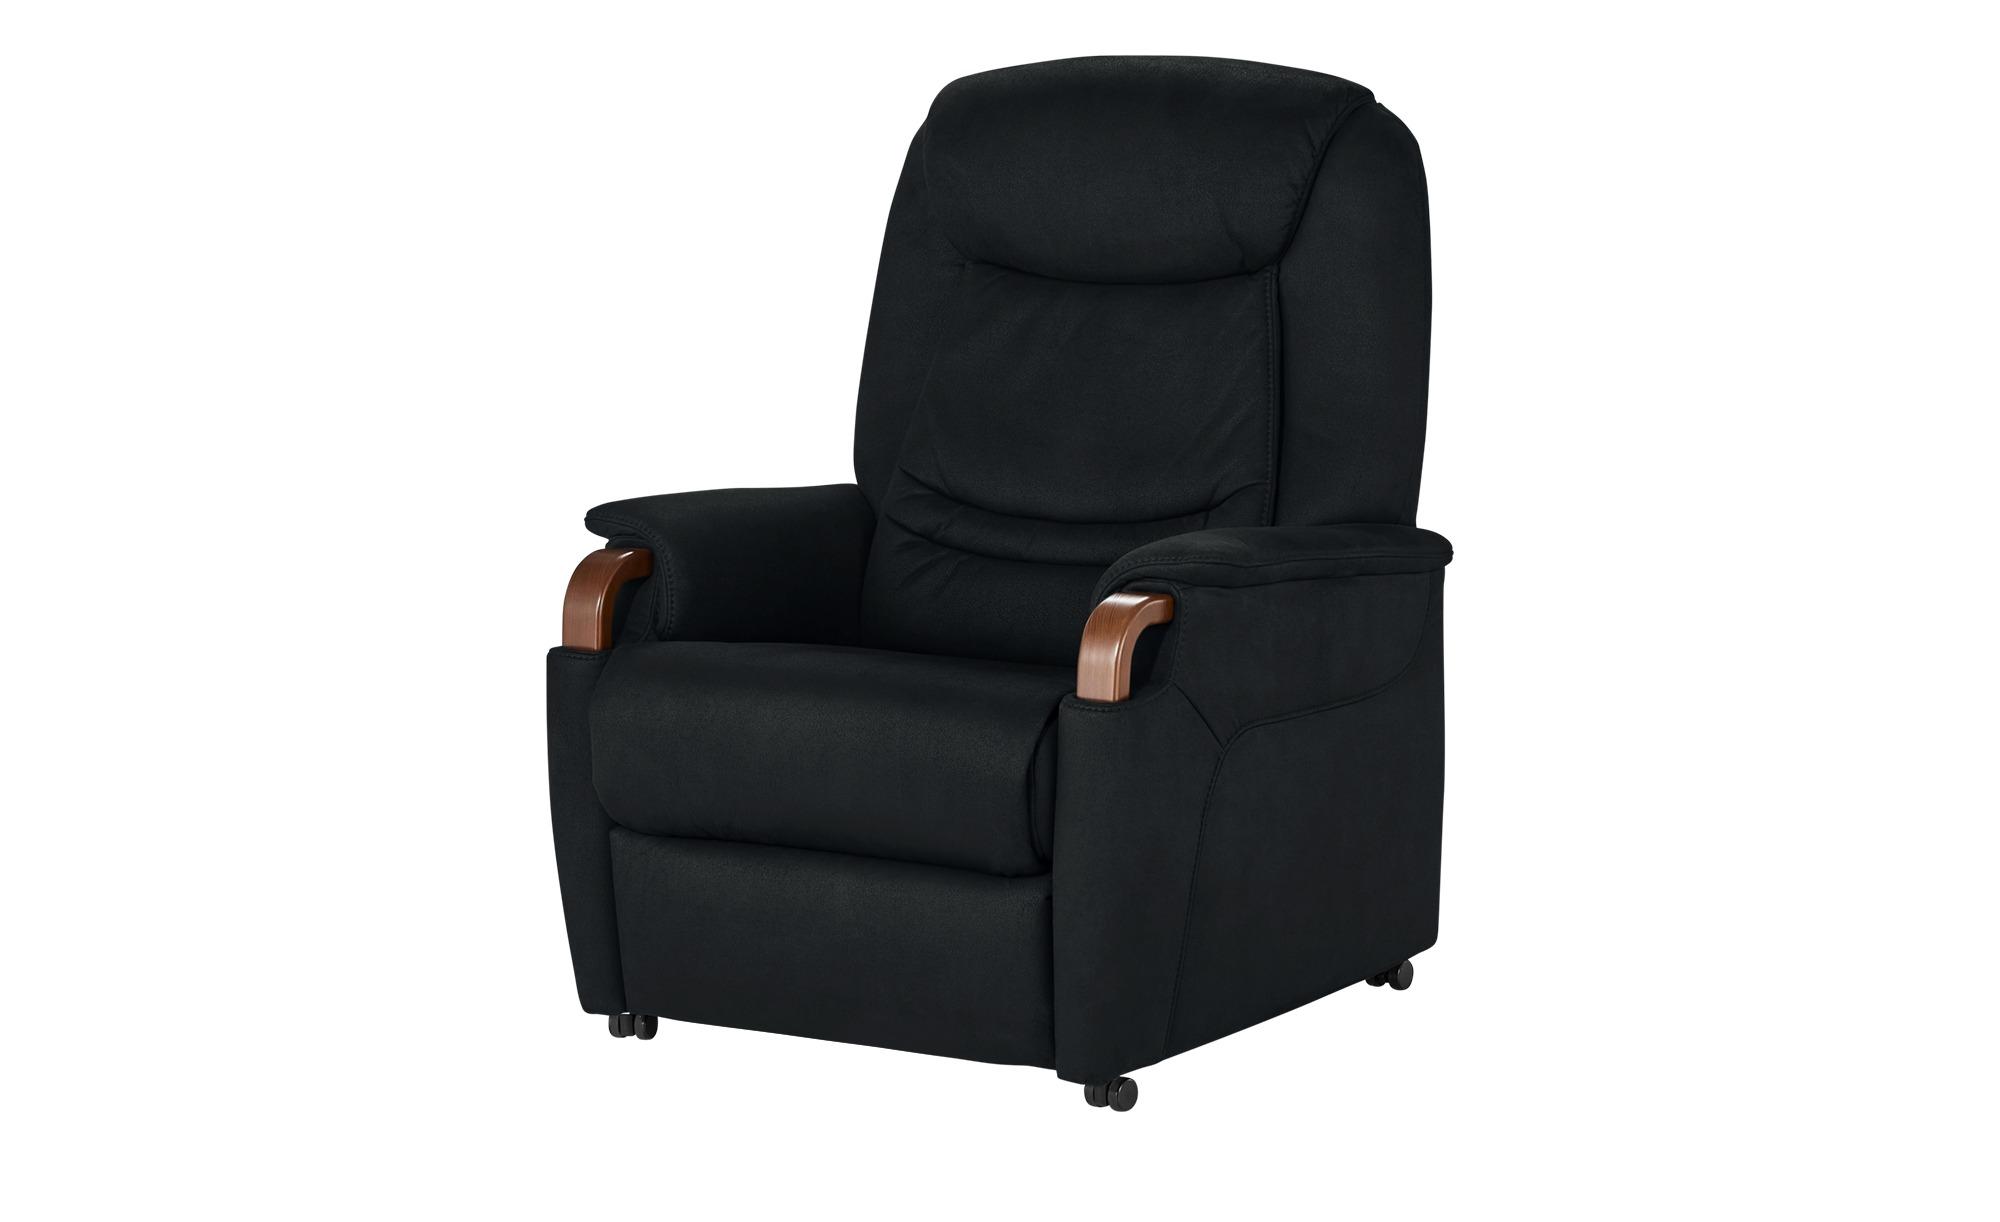 Hukla Relaxsessel  Jonas ¦ schwarz ¦ Maße (cm): B: 83 H: 106 T: 82 Polstermöbel > Sessel > Fernsehsessel - Höffner